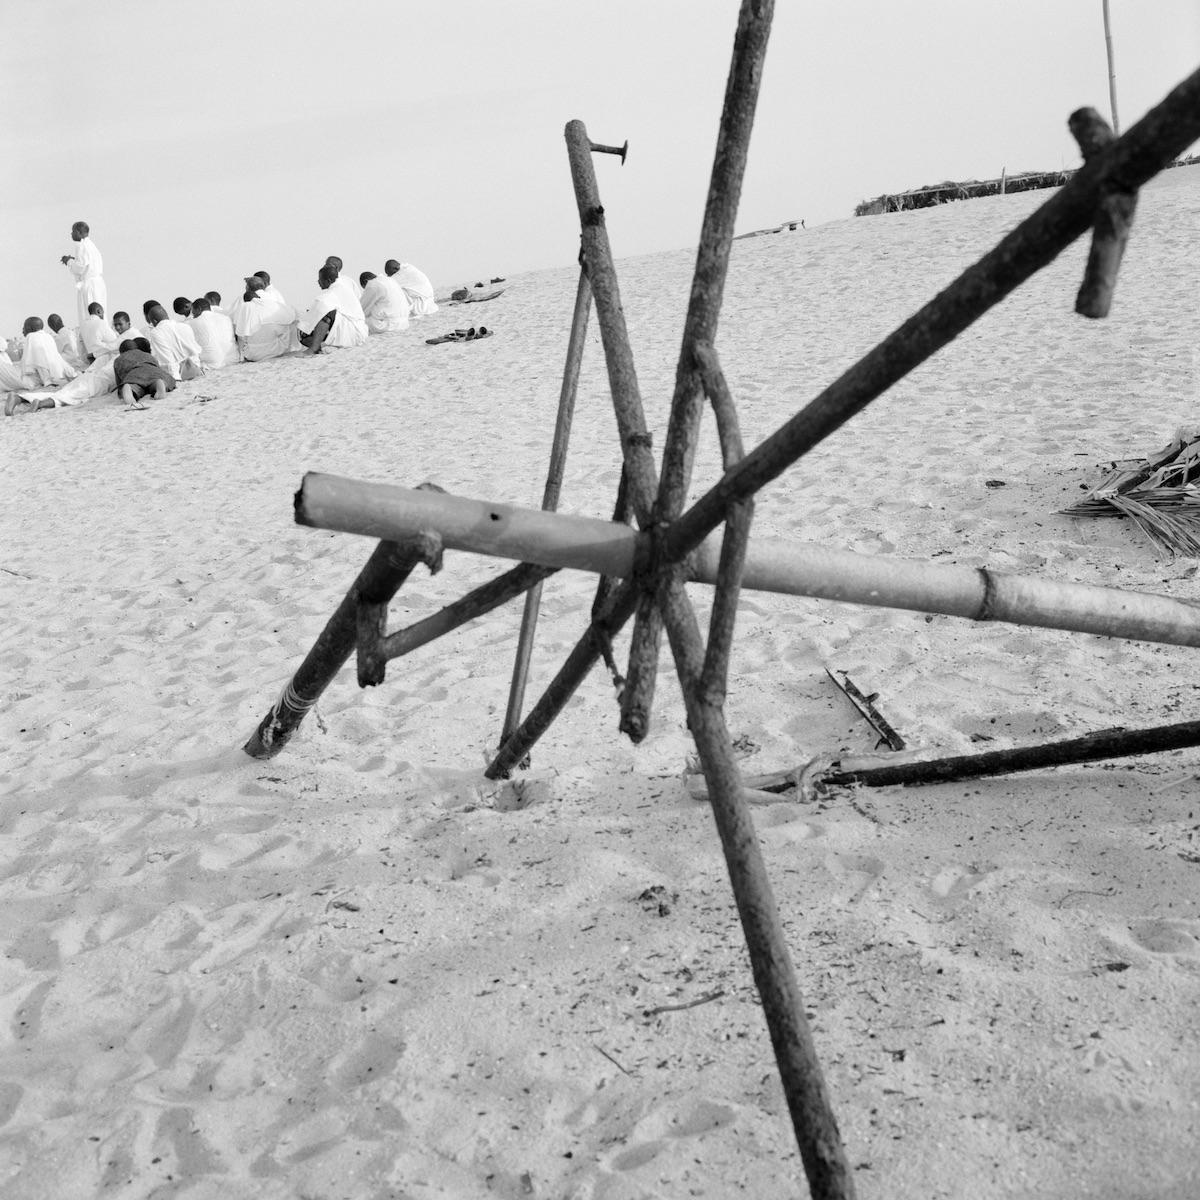 Akinbode Akinbiyi, Bar Beach, Victoria Island, Lagos, 2004 © the artist